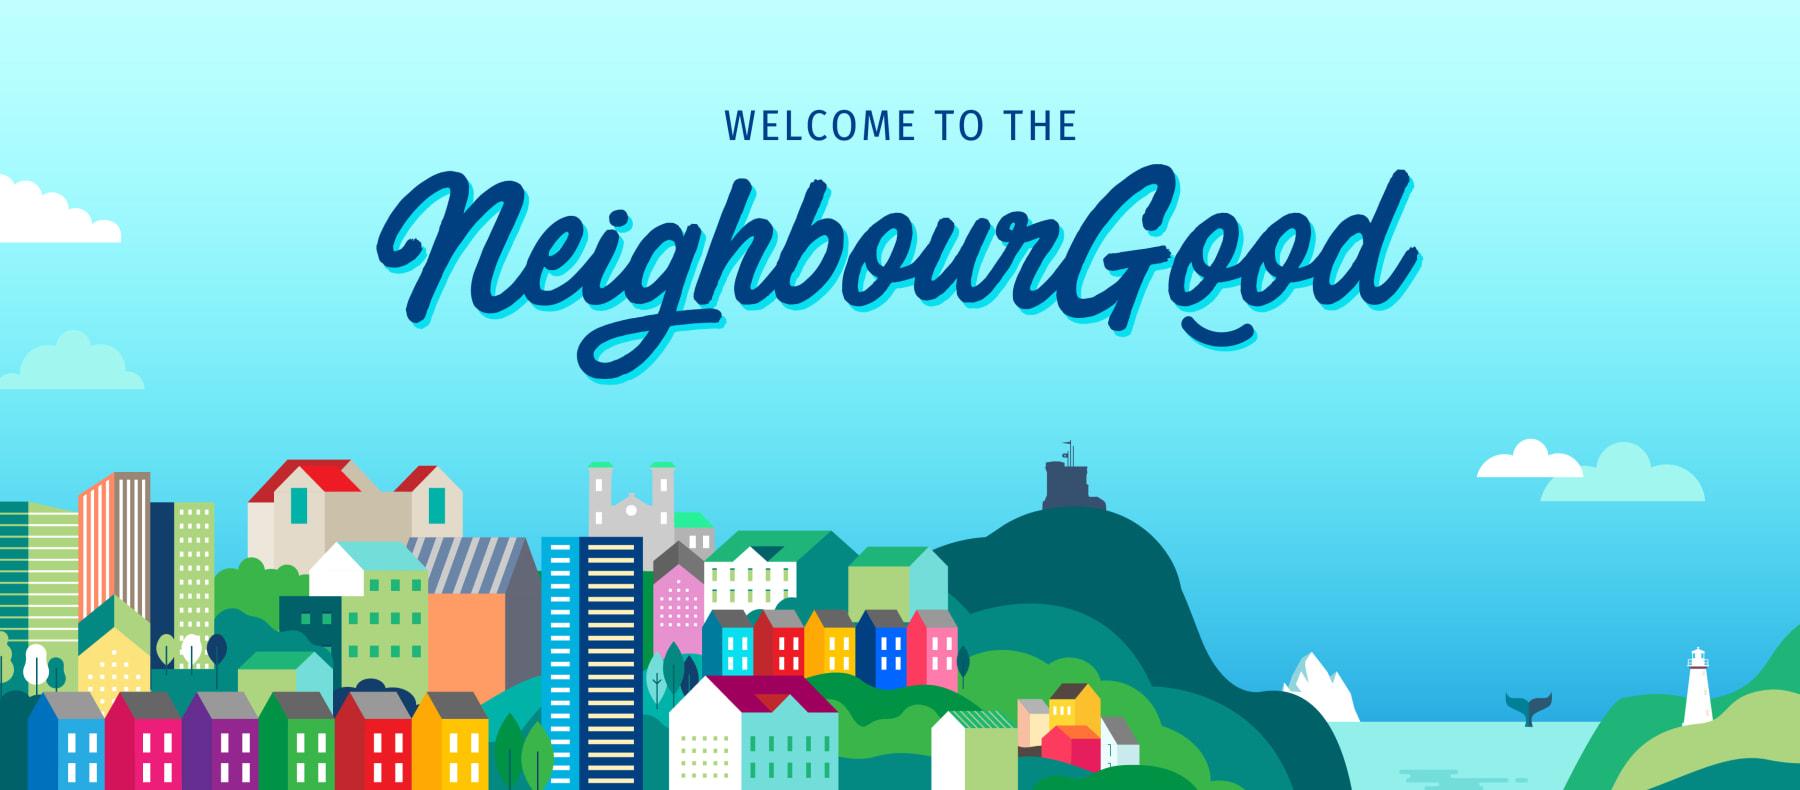 The NeighbourGood.ca